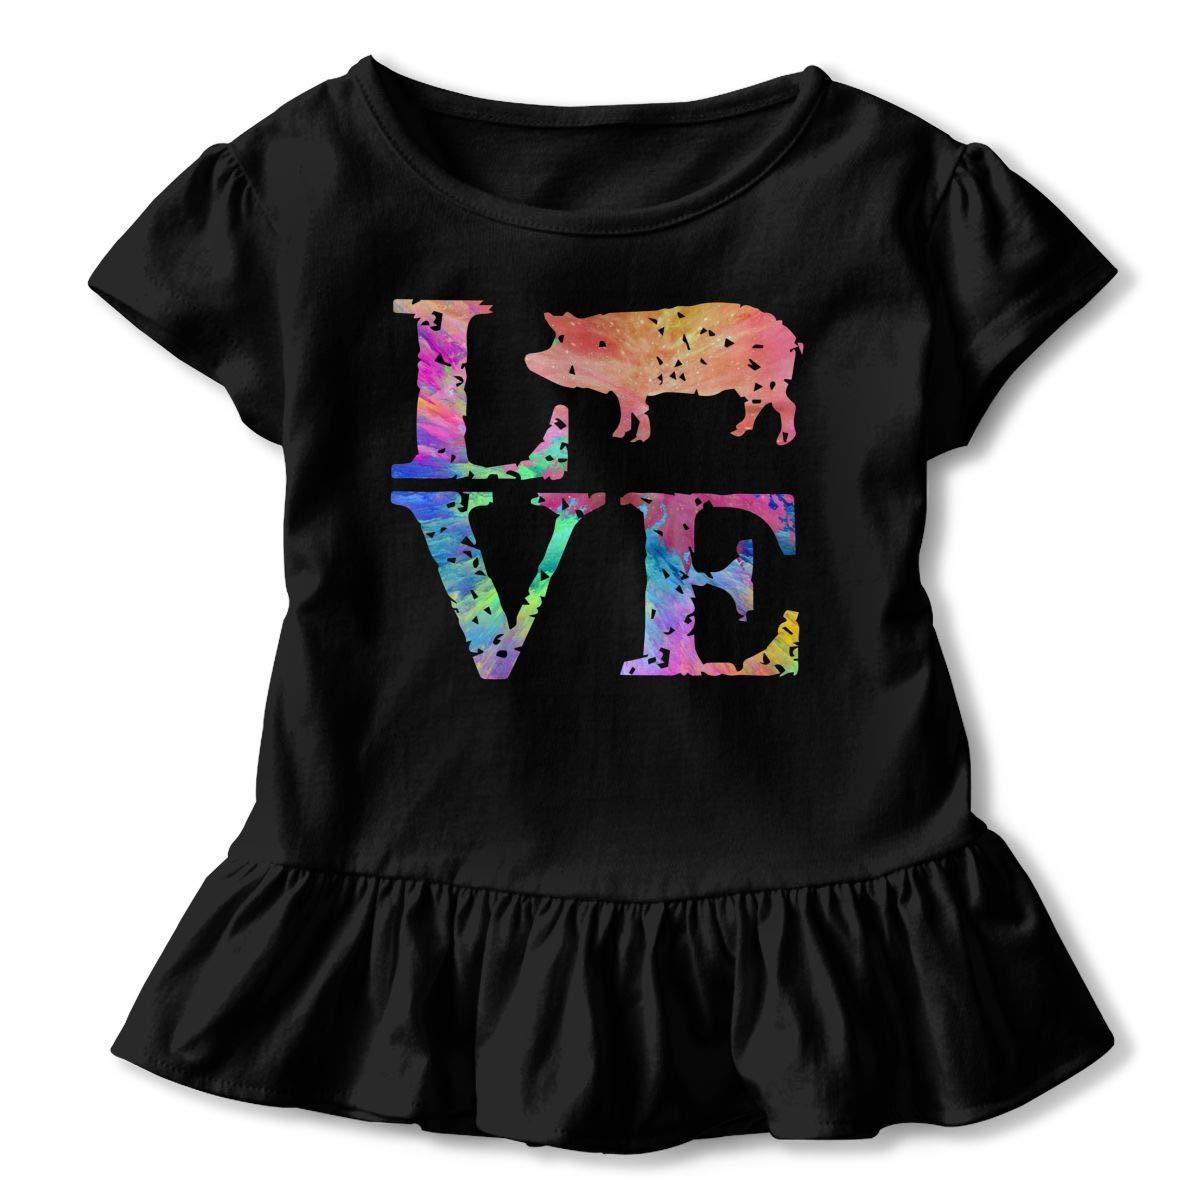 Colorful Distress Love Pig Toddler Baby Girls Short Sleeve Ruffle T-Shirt